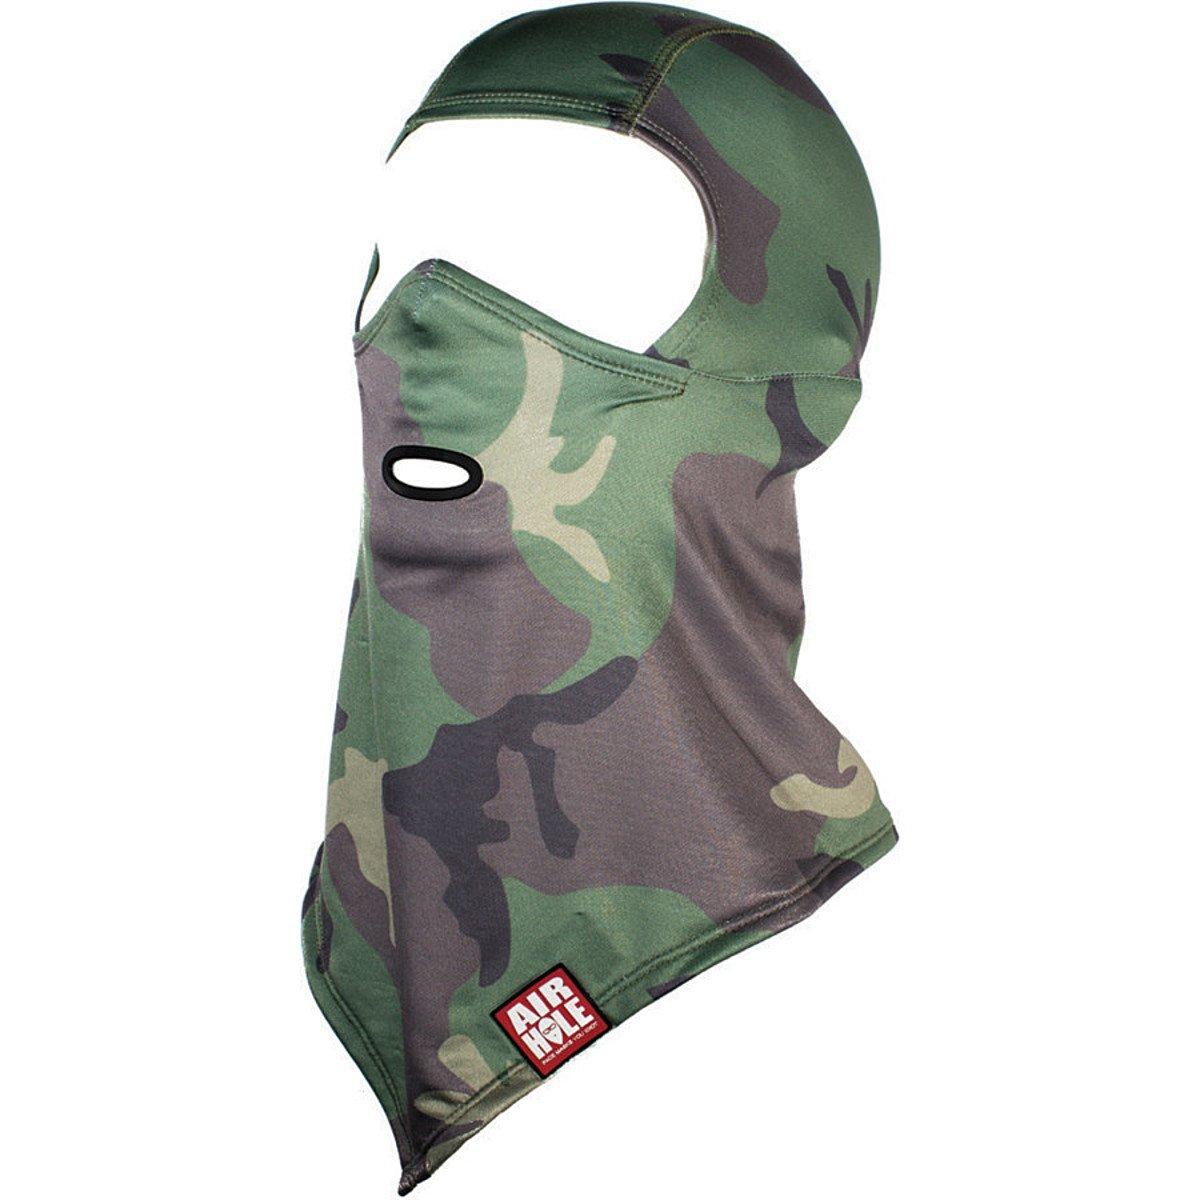 Airhole Adult Woodland Standard Balaclava Face Mask, One Size